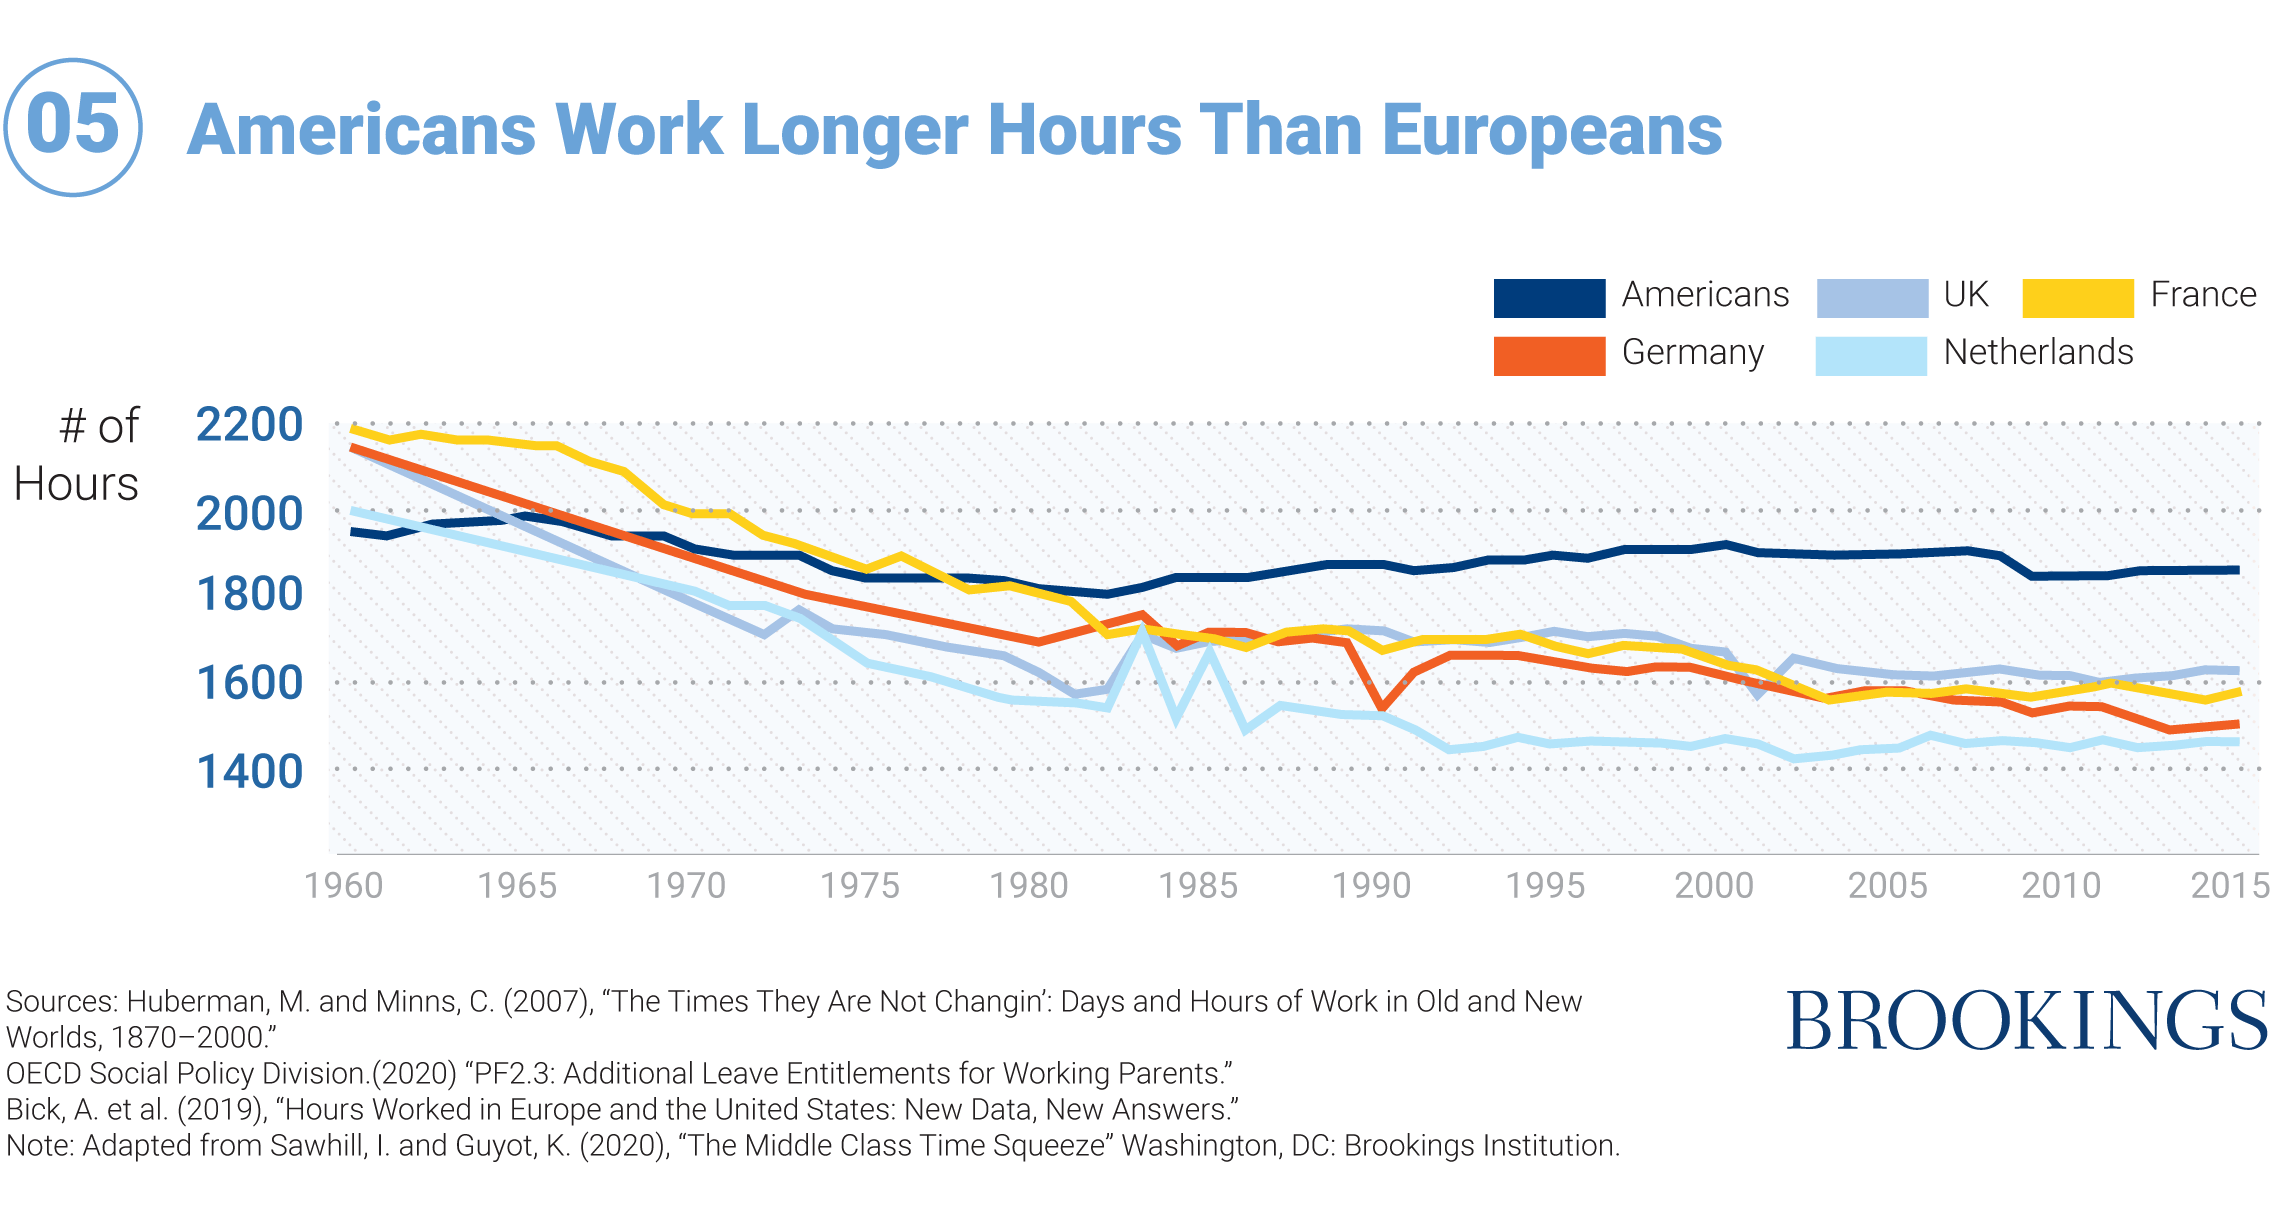 Americans work longer hours than Europeans